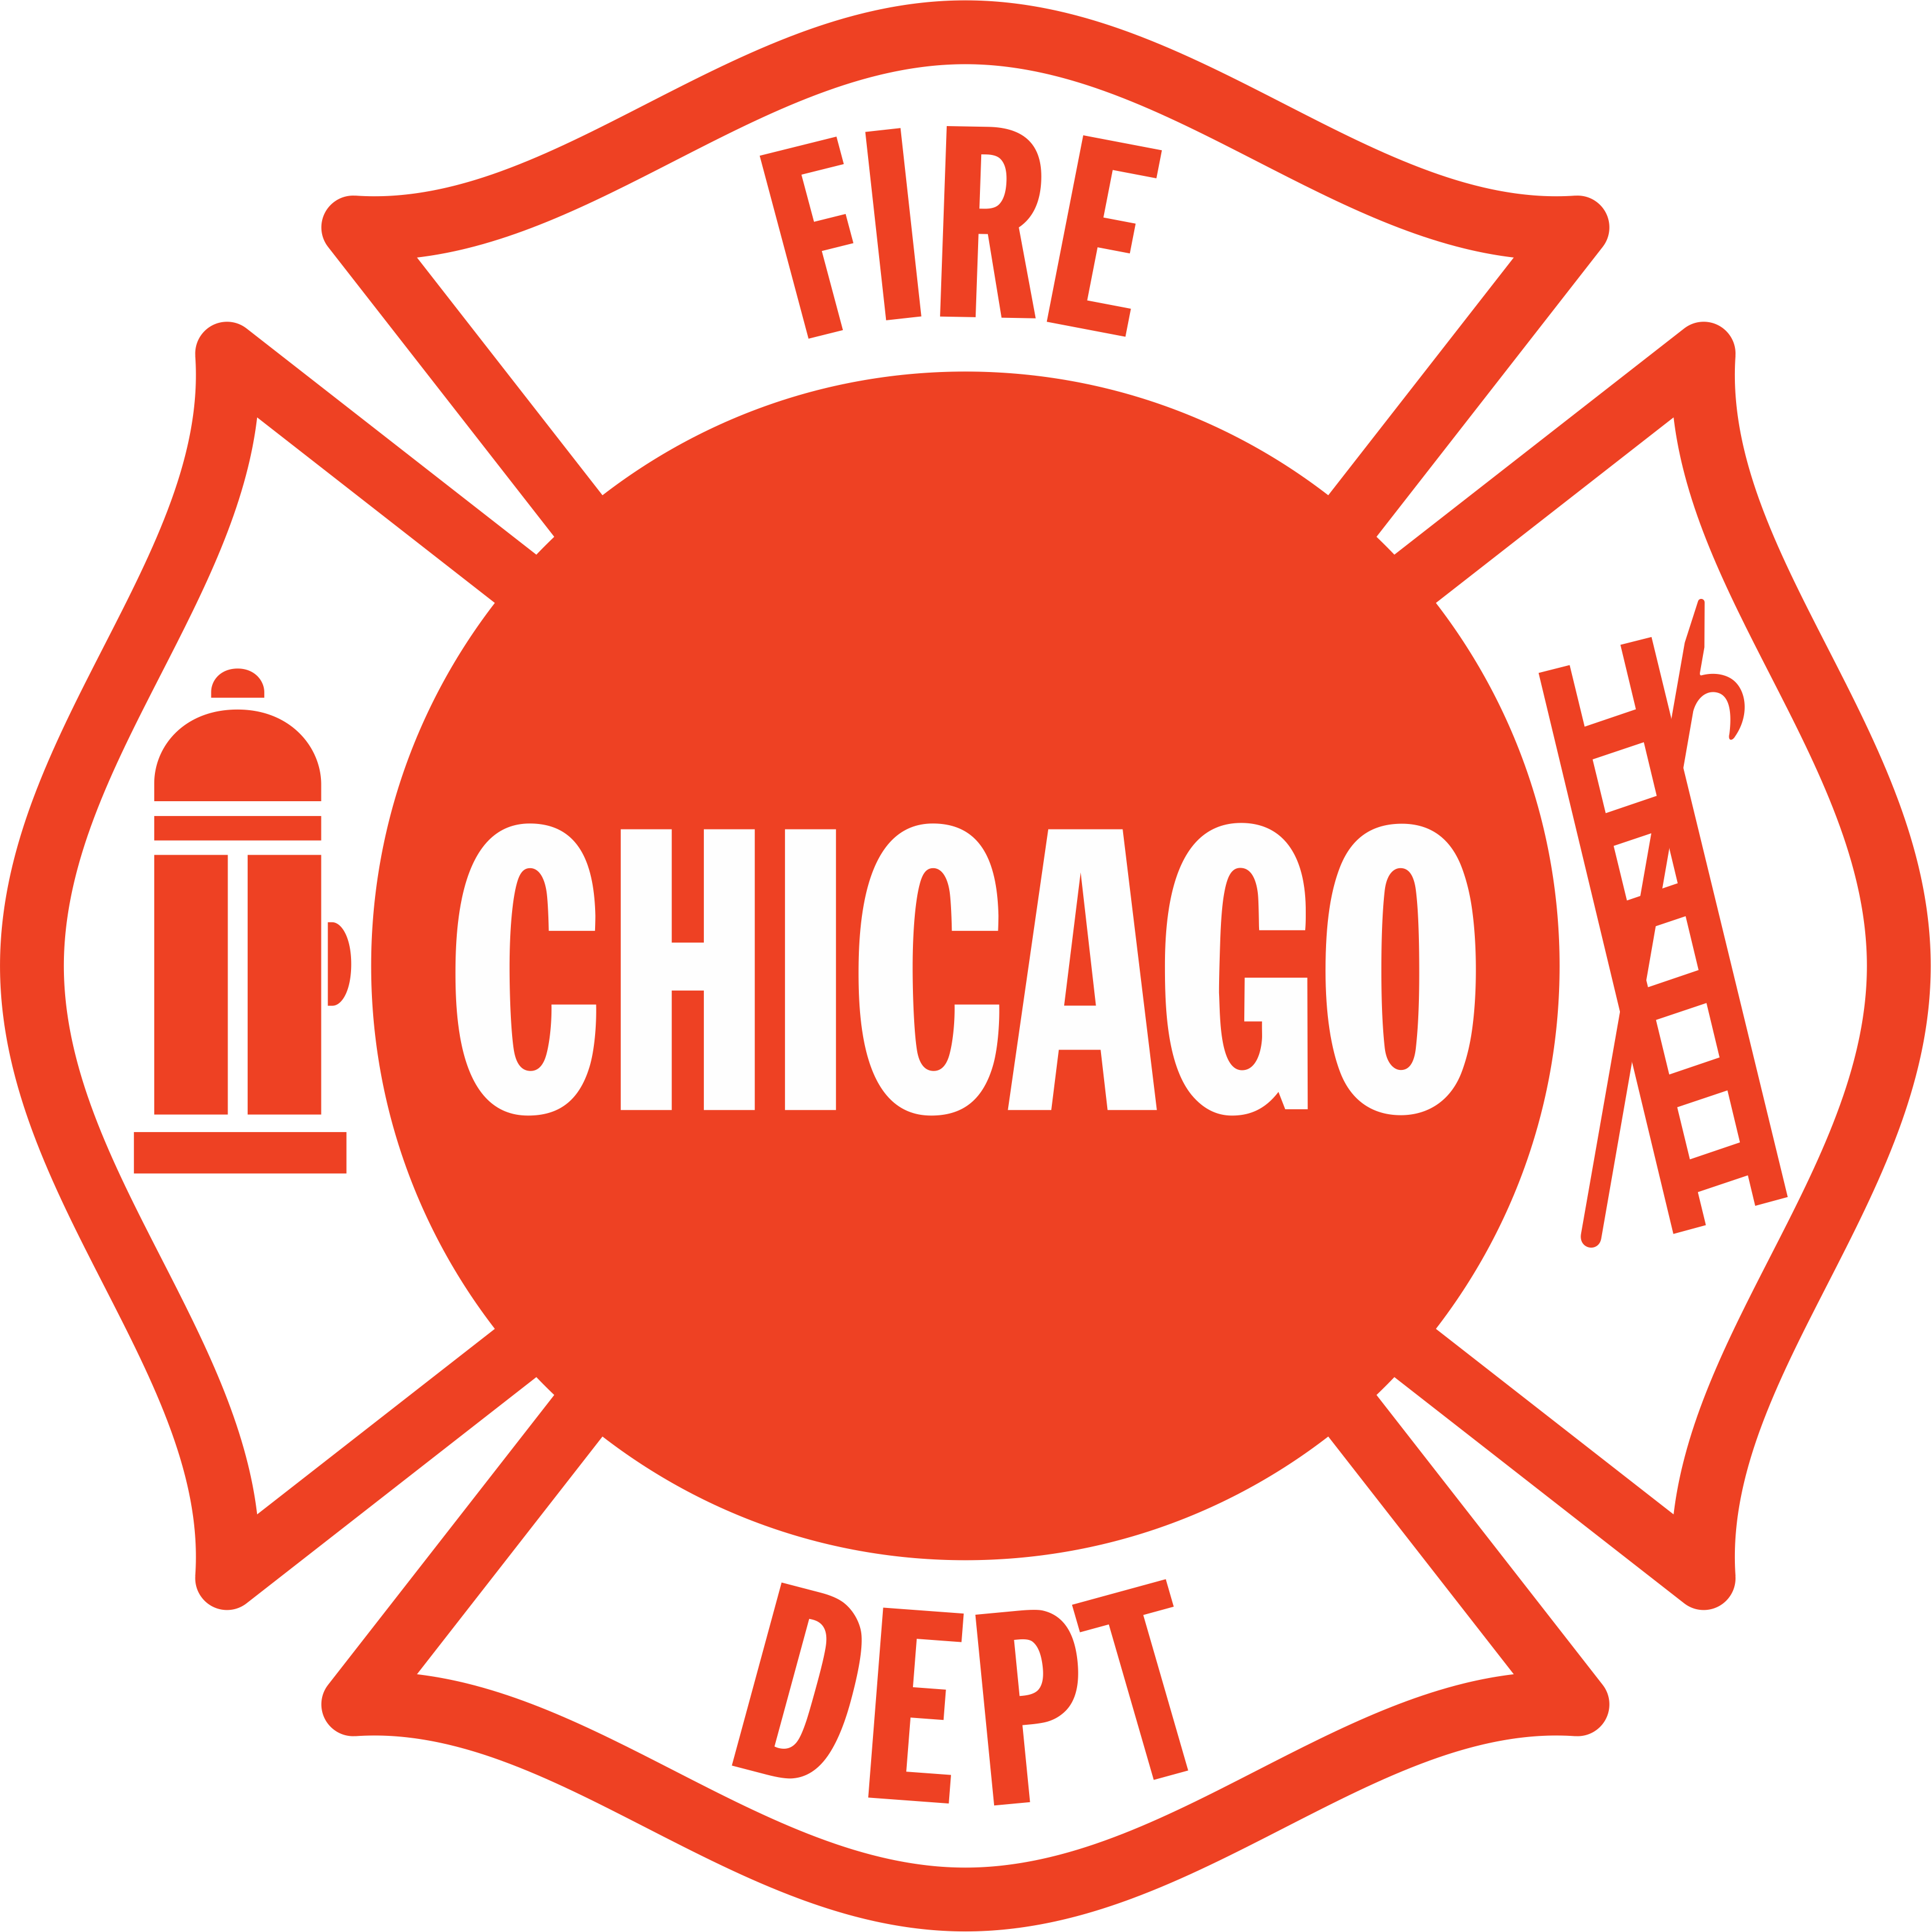 Chicago Fire Dept. sticker in 2020 Chicago fire, Fire